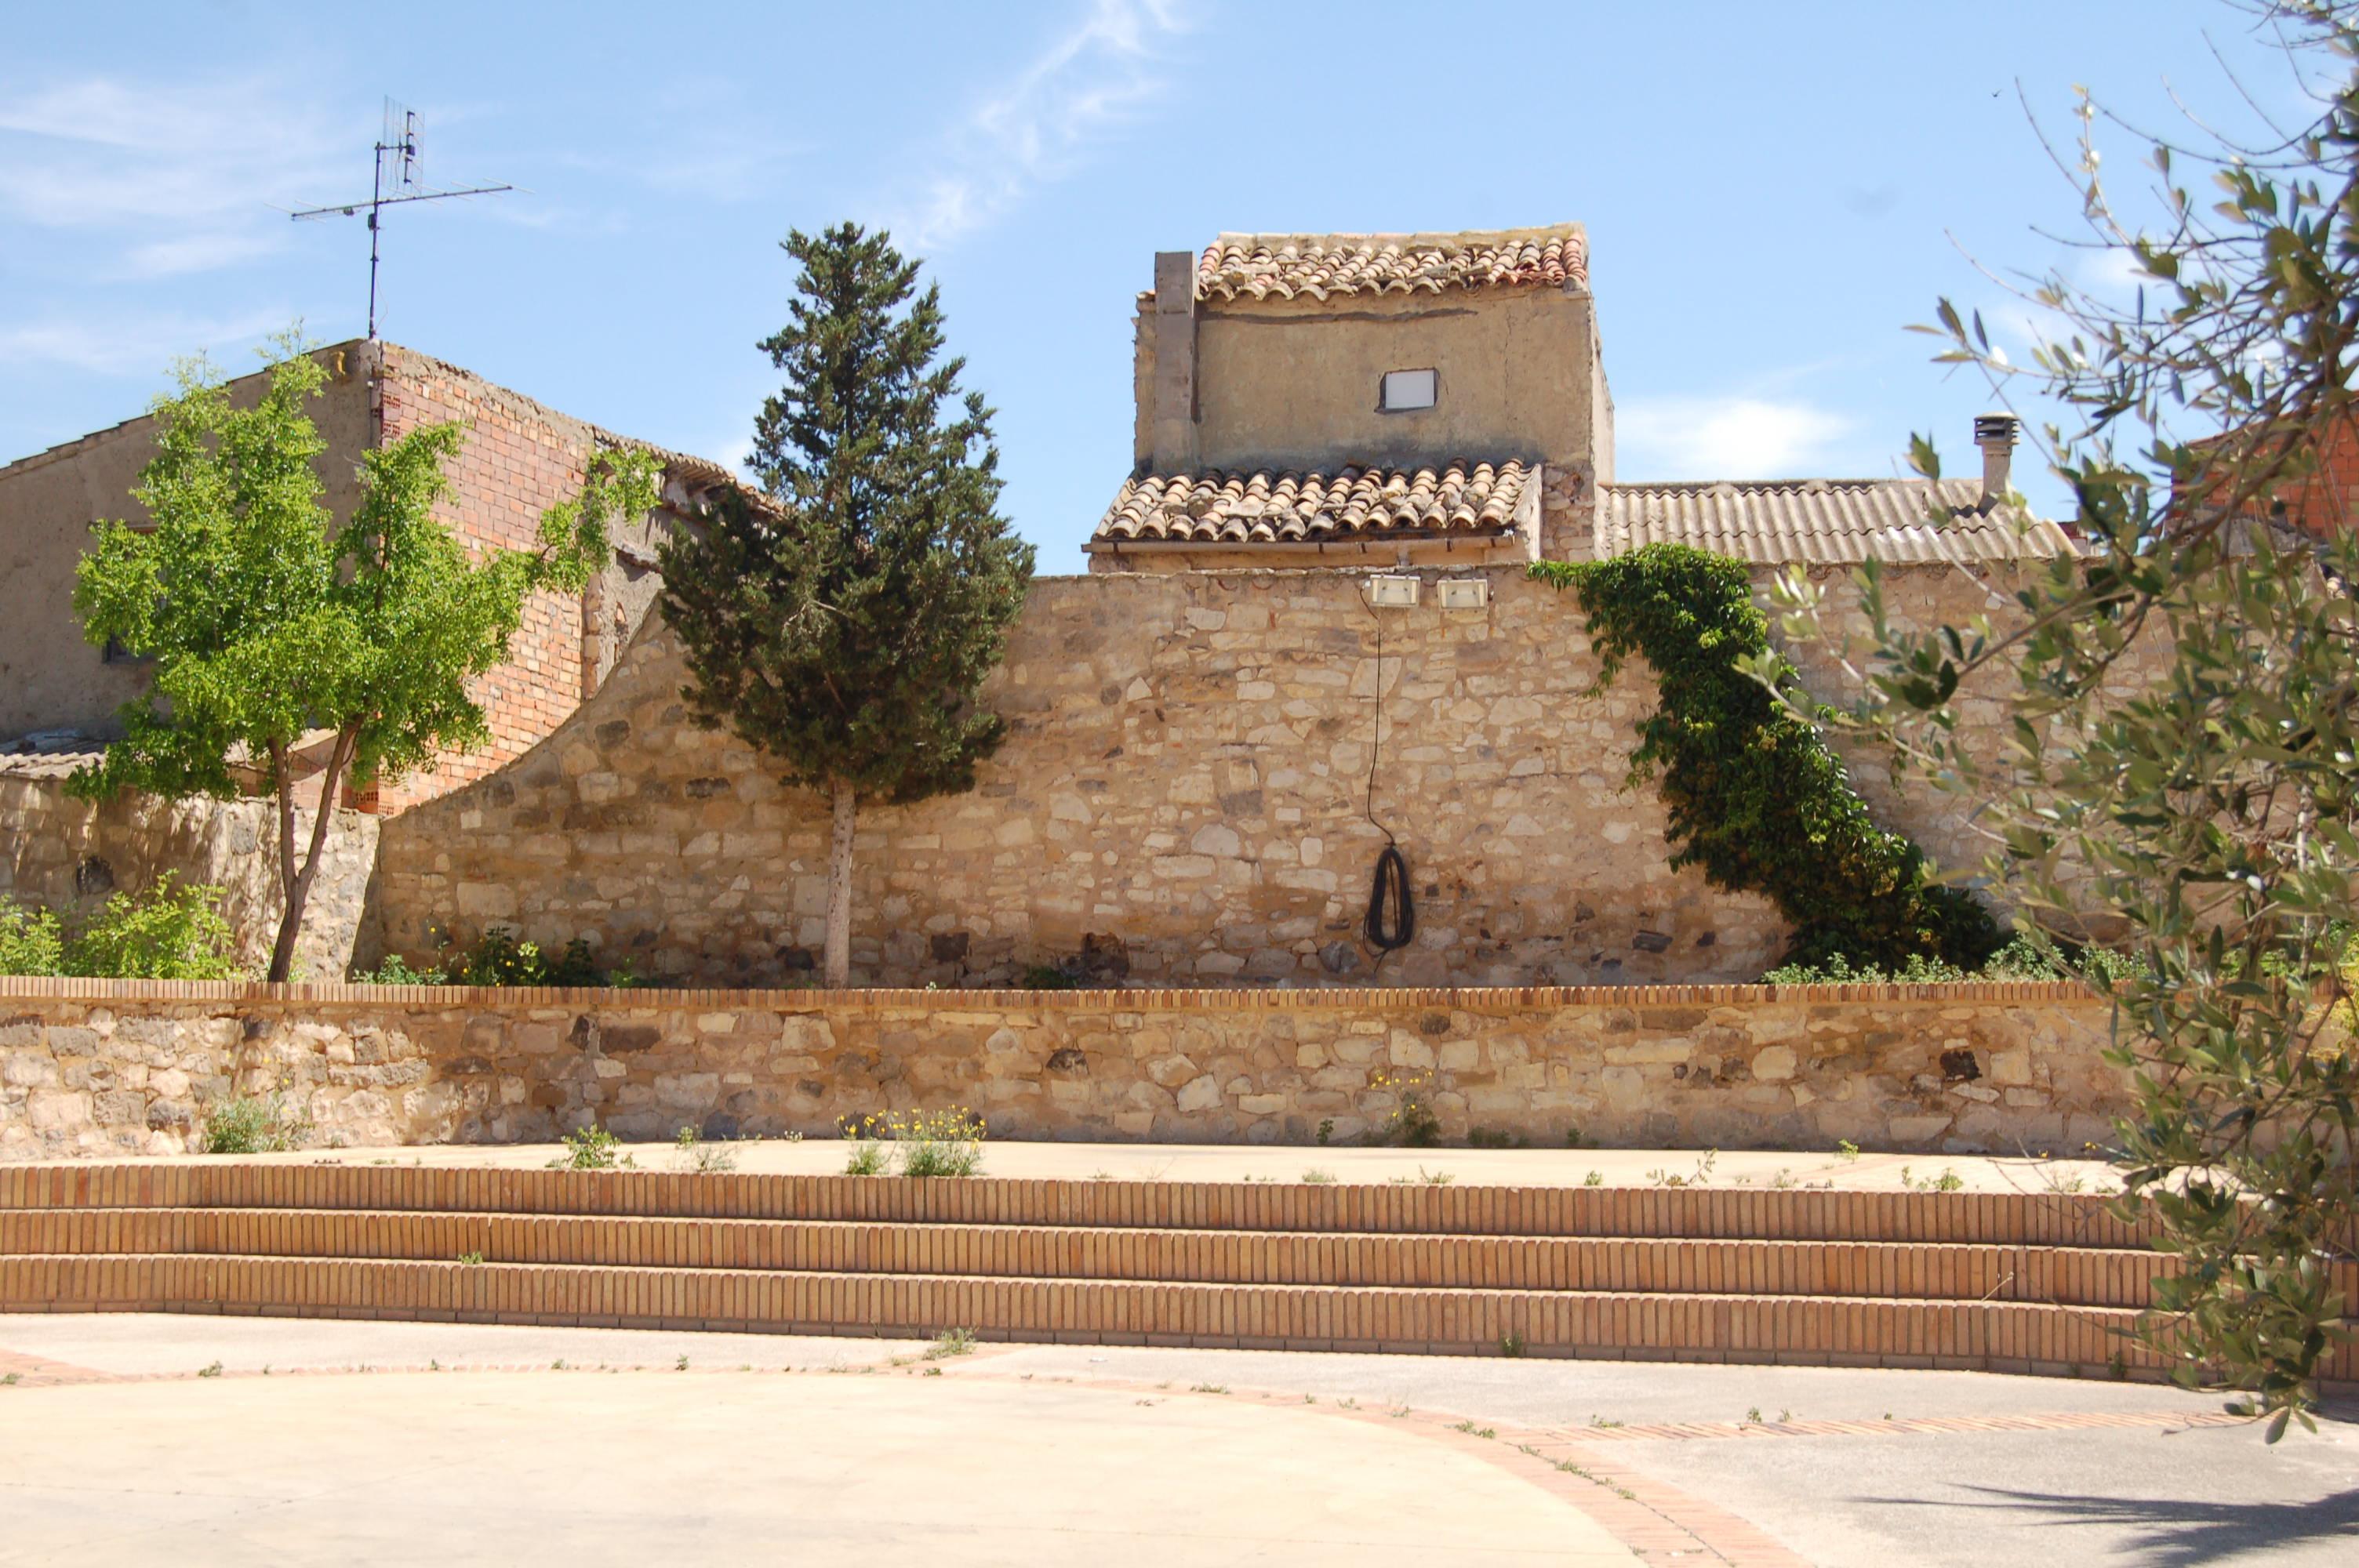 foto-original-Plaza-del-Castillo-4c2da9fb35a35